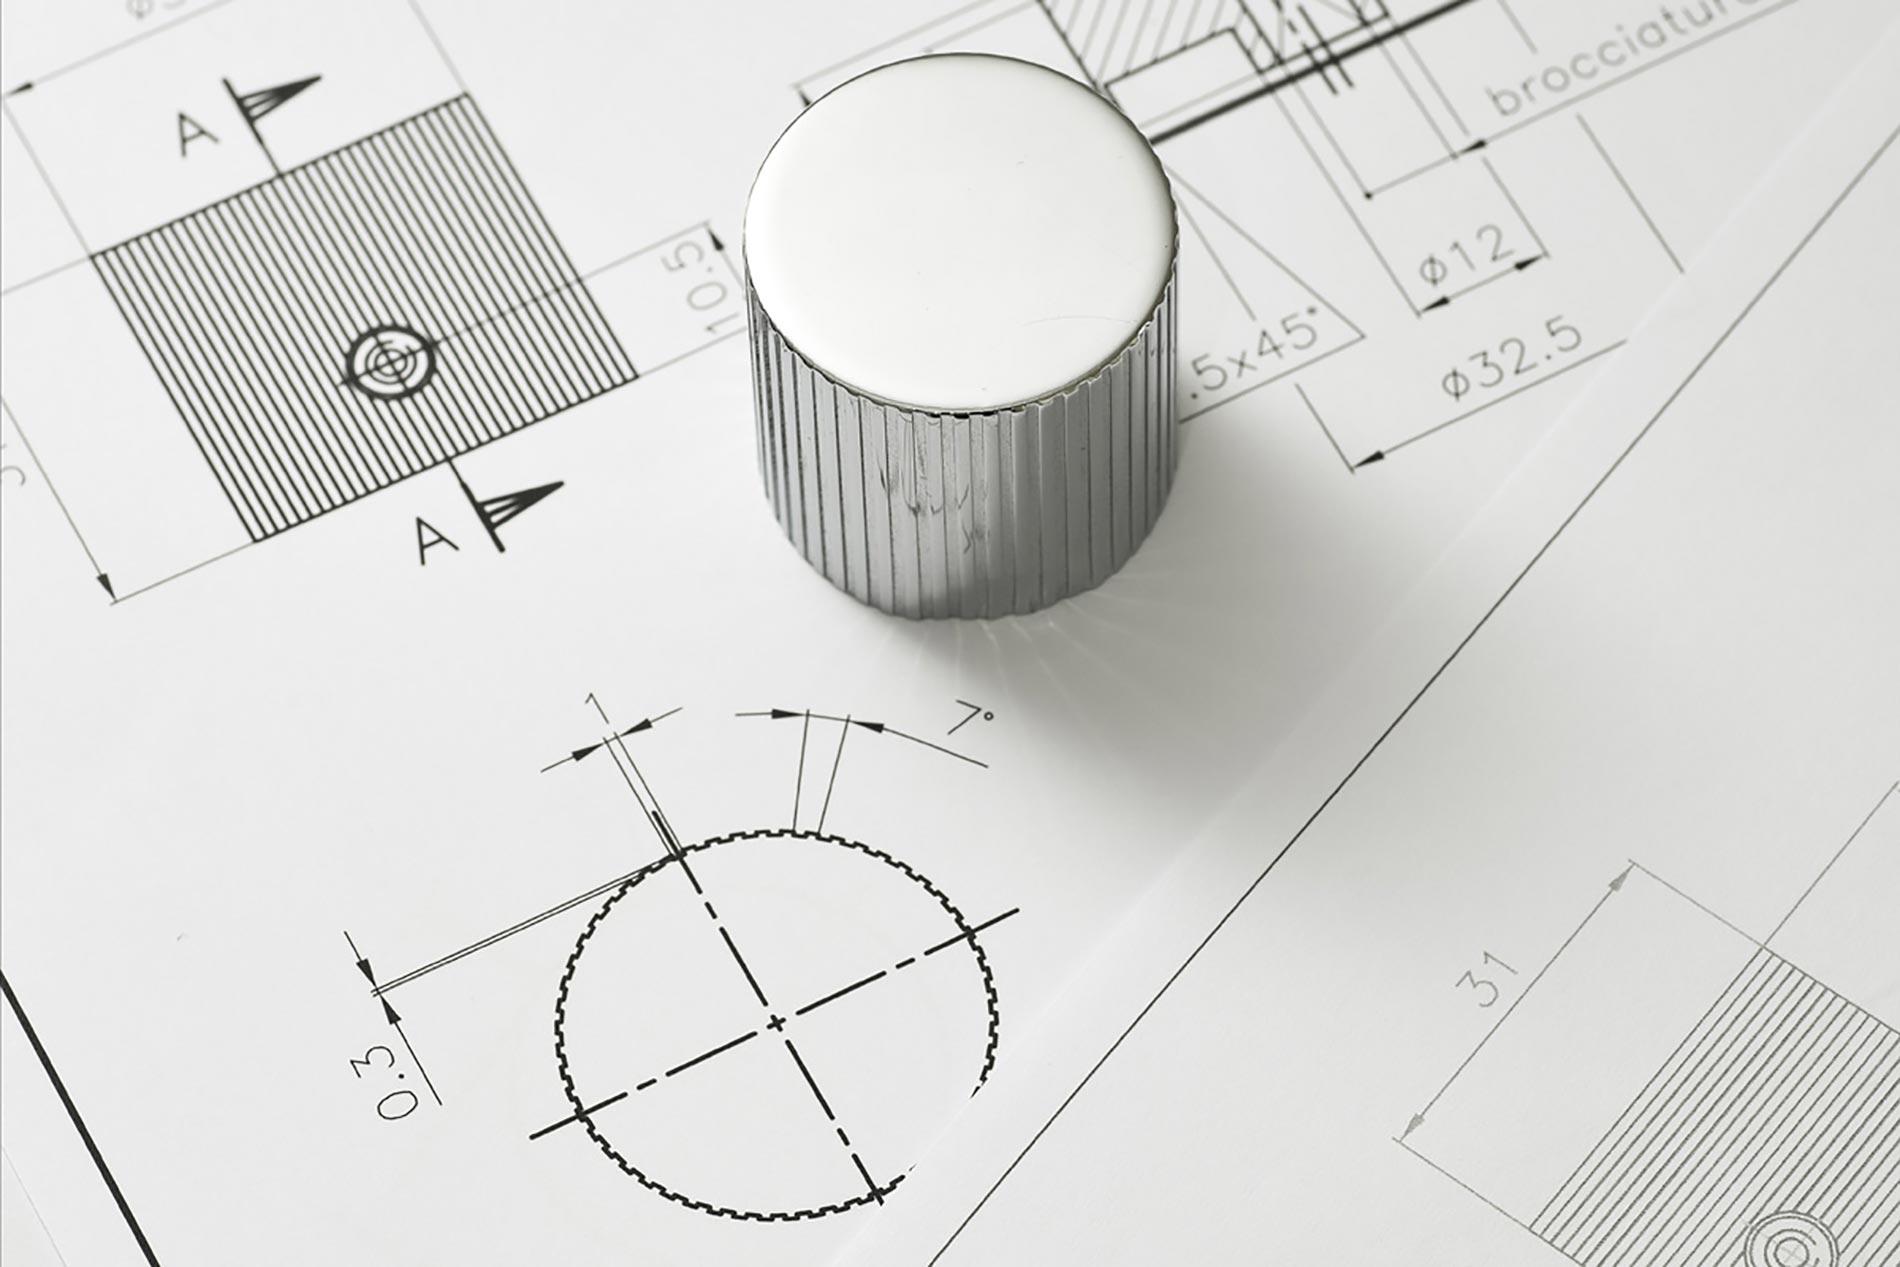 adi ceramics and bathroom design award 2018